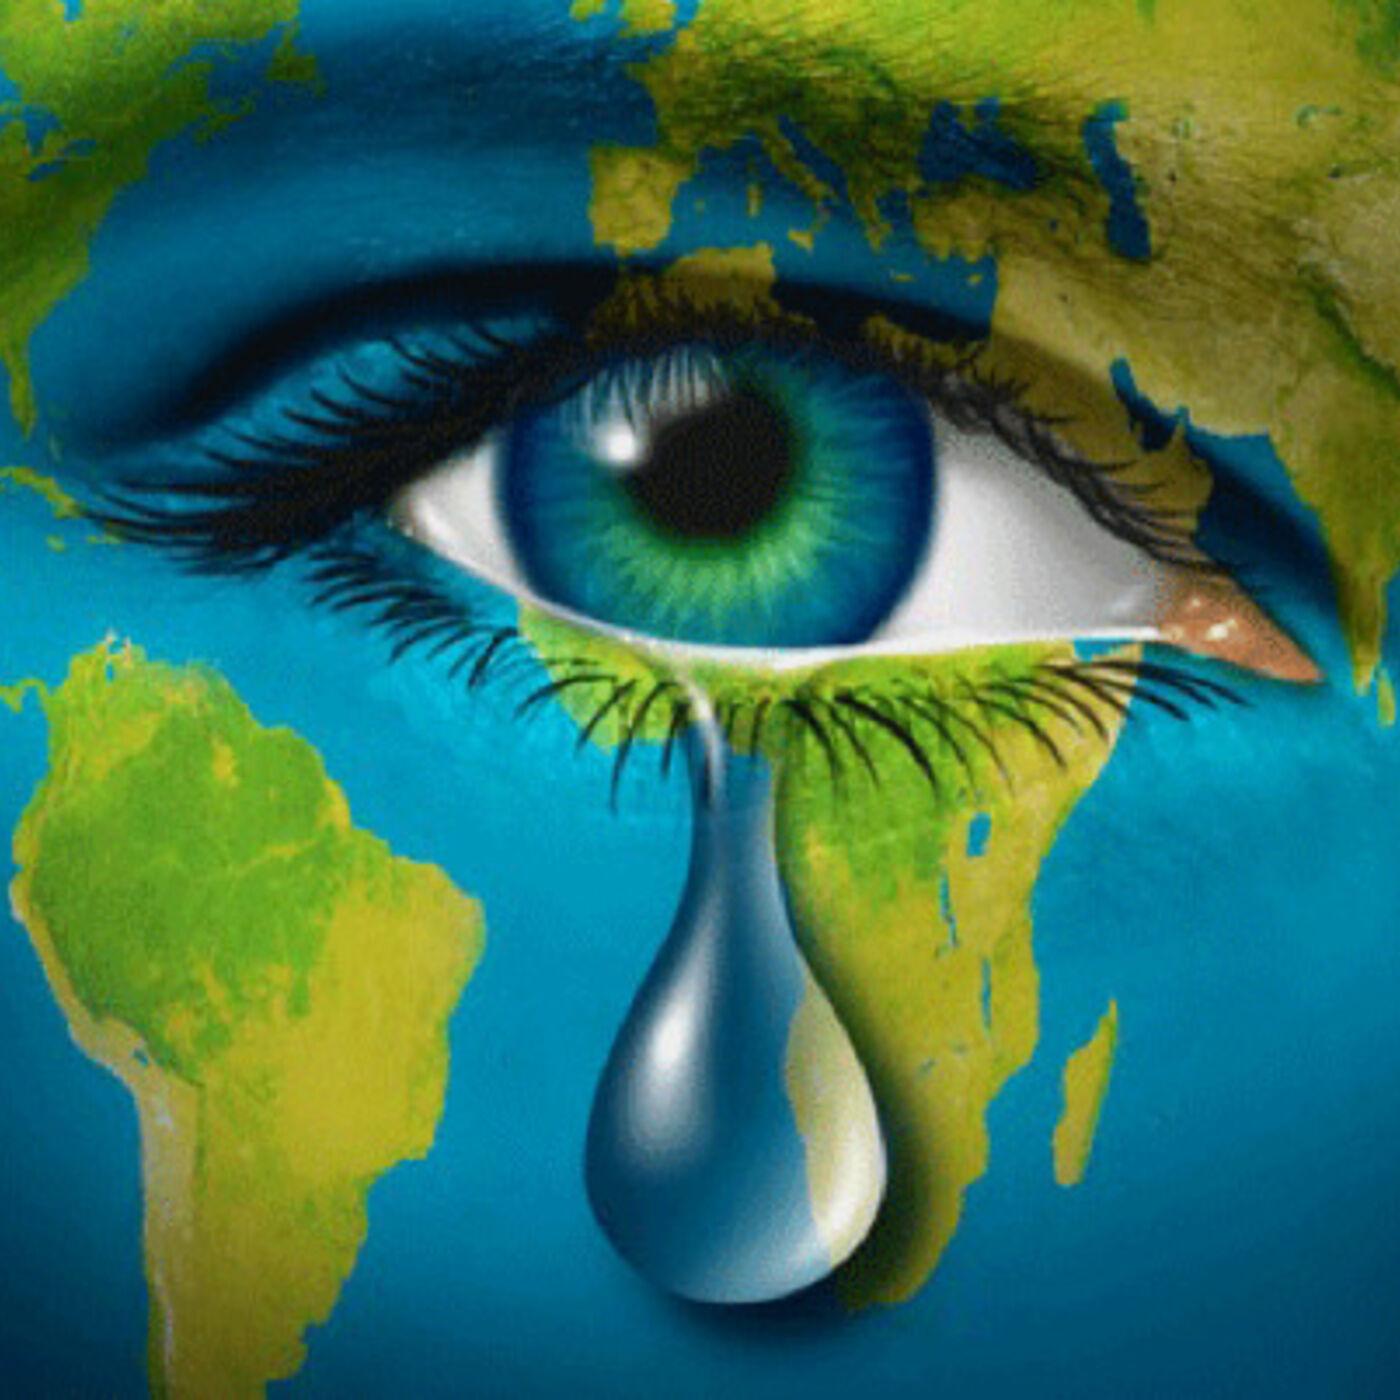 Sorrow Upon The Earth